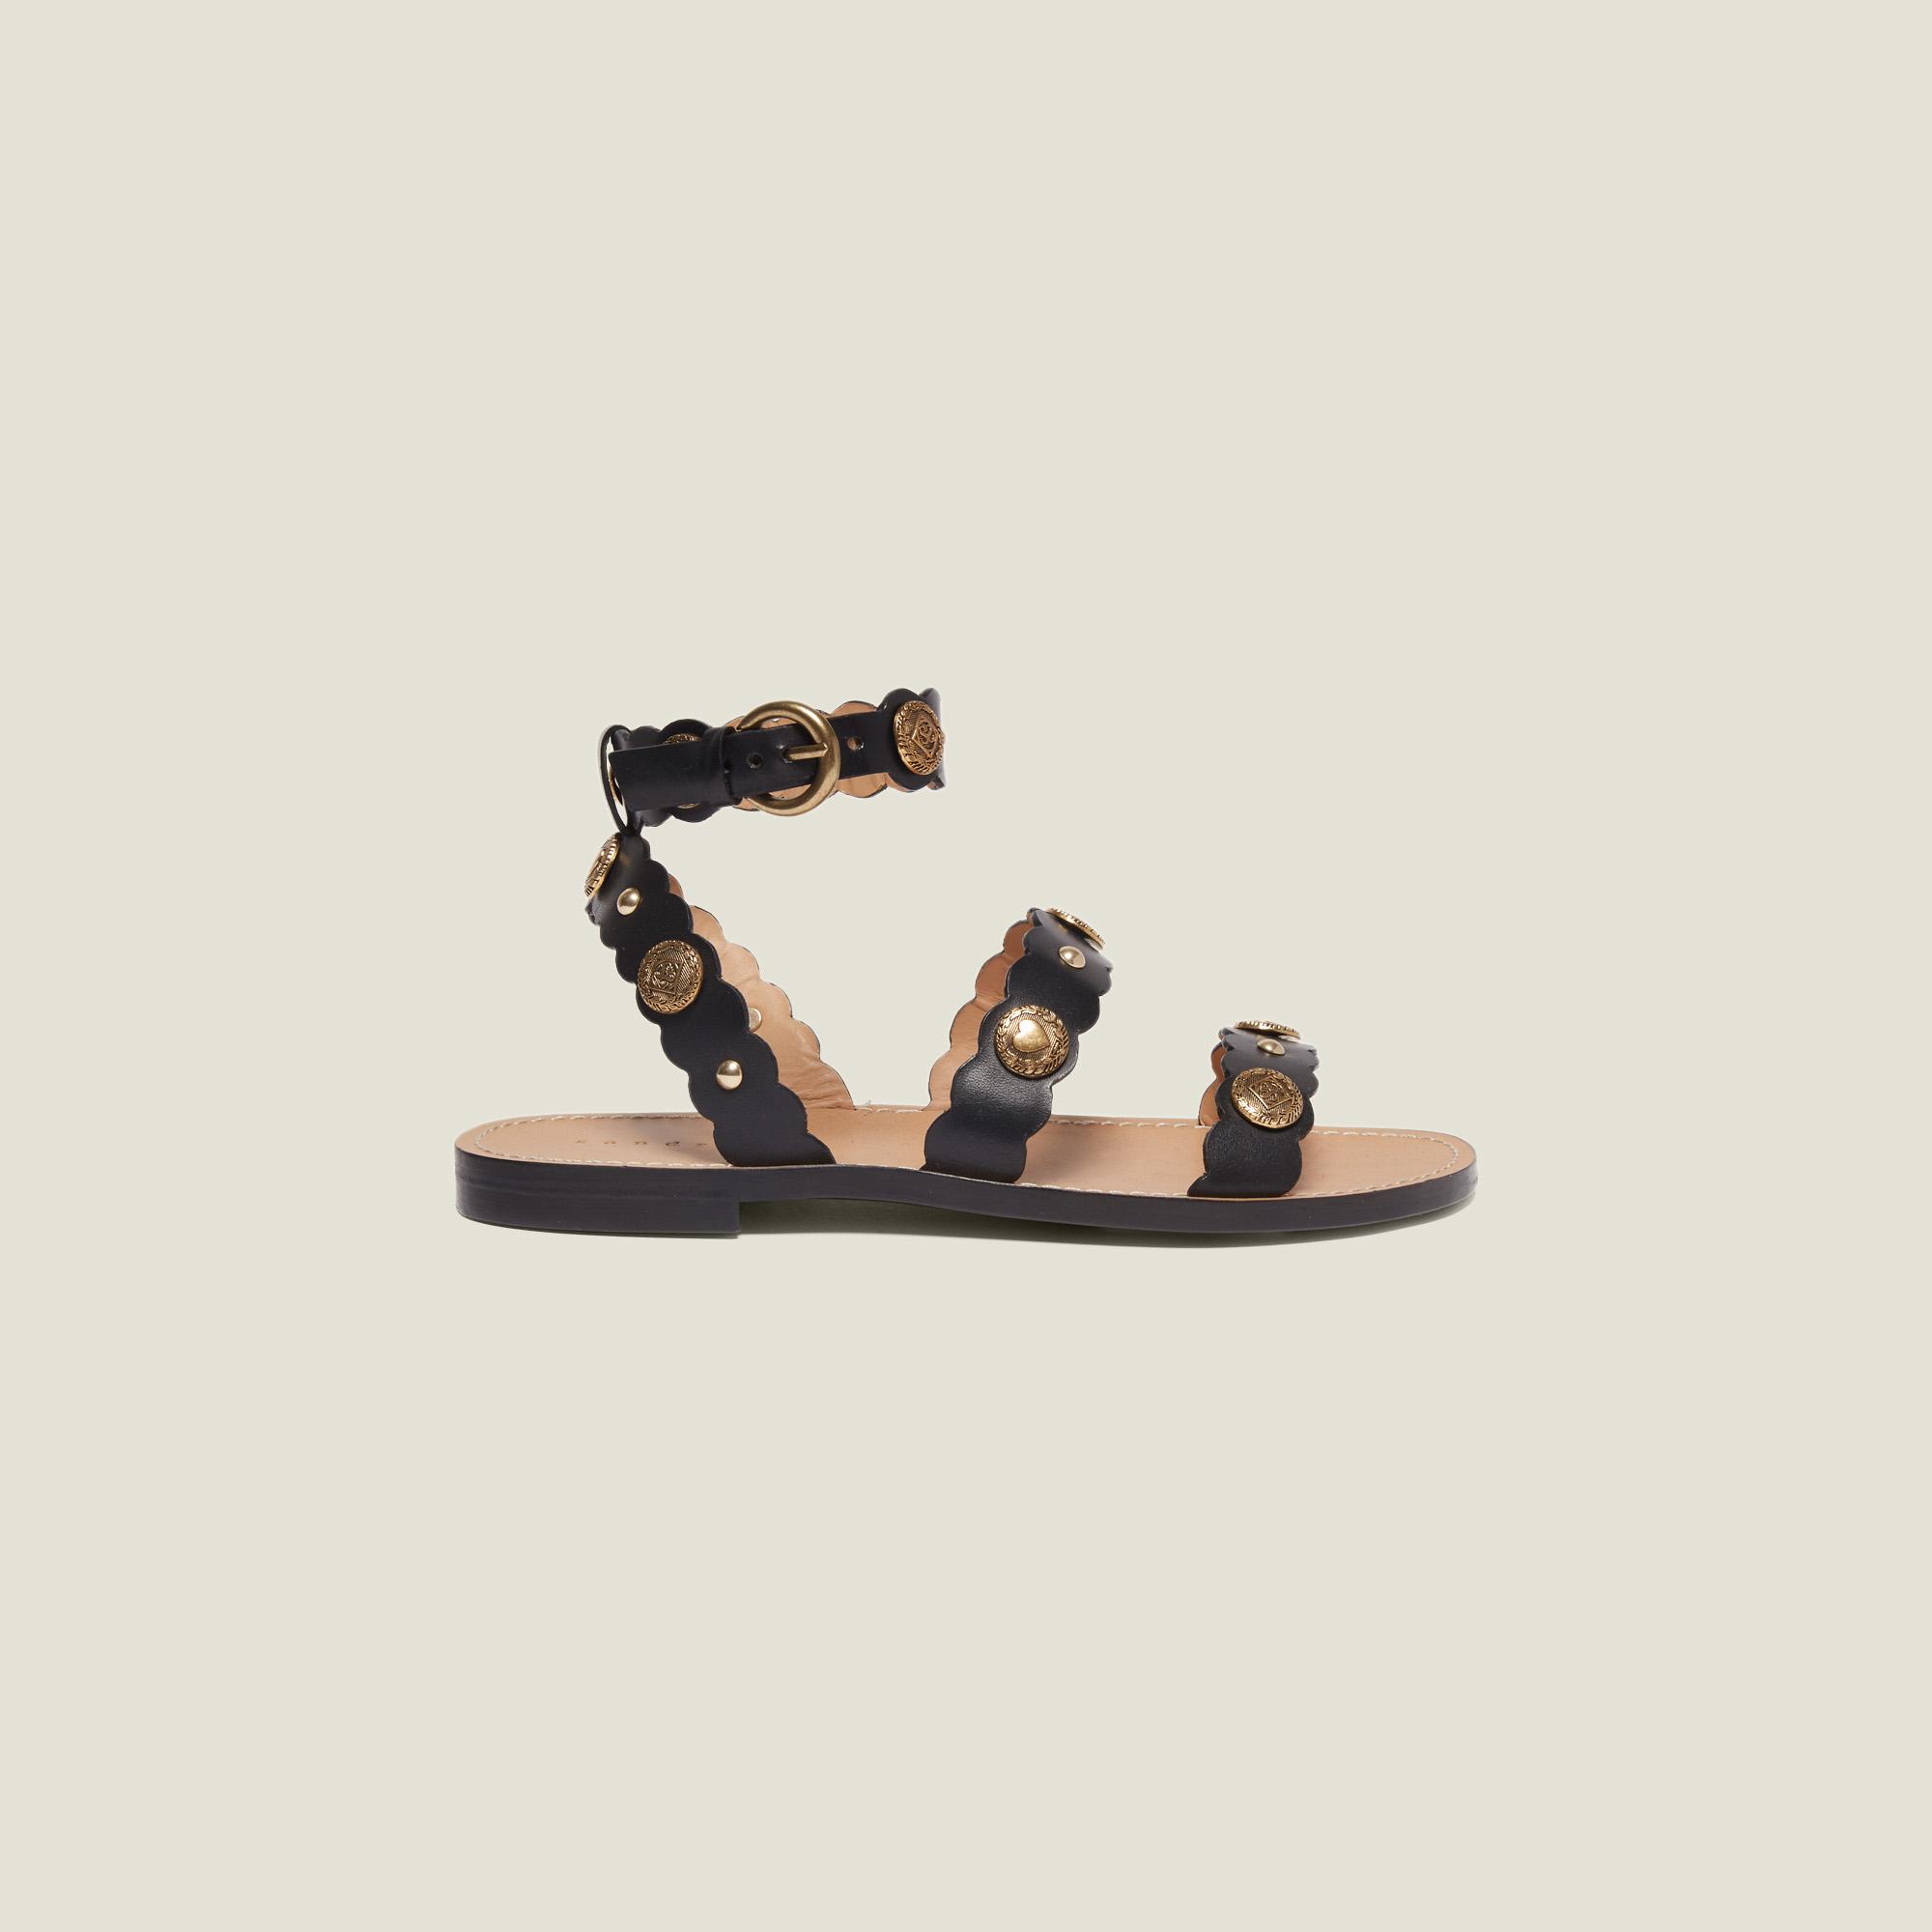 76871f472 Flat Sandals With Decorative Rivets : Shoes color Black ...